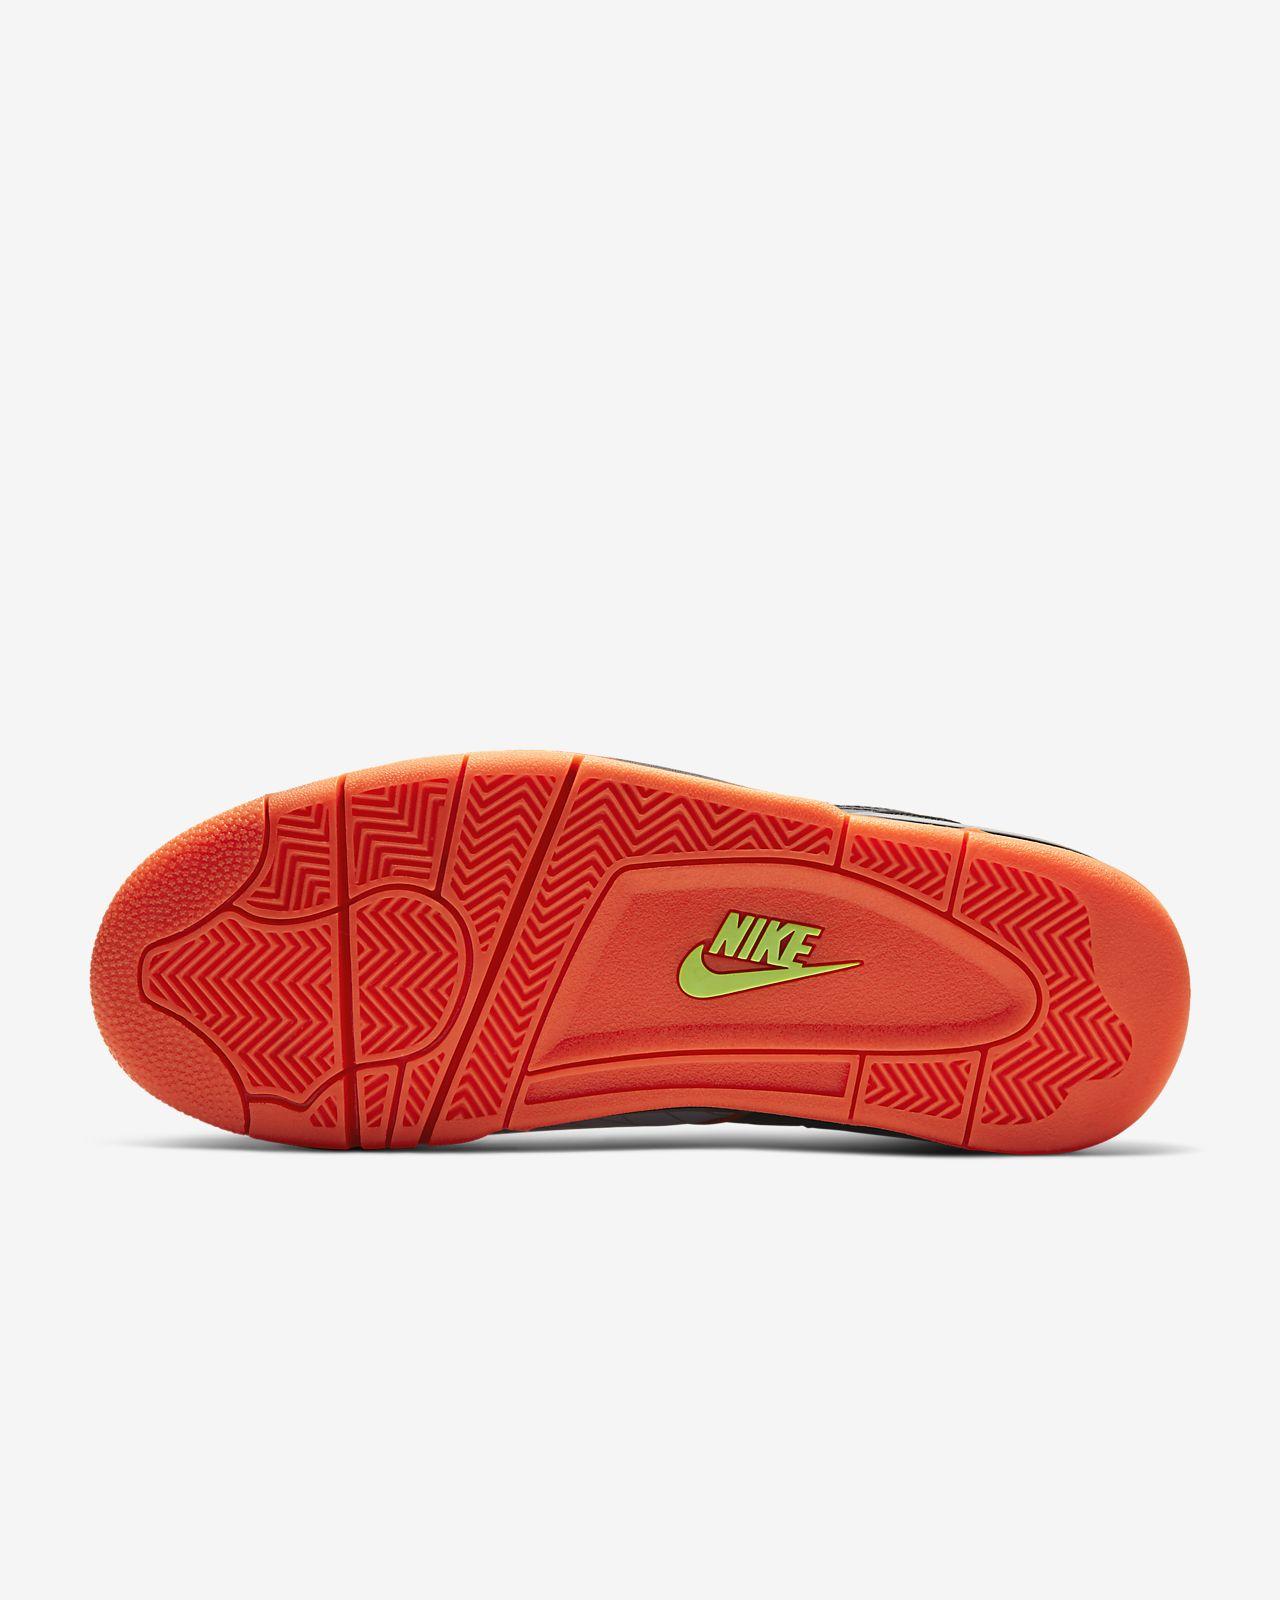 Nike Air Flight 89 Herenschoen